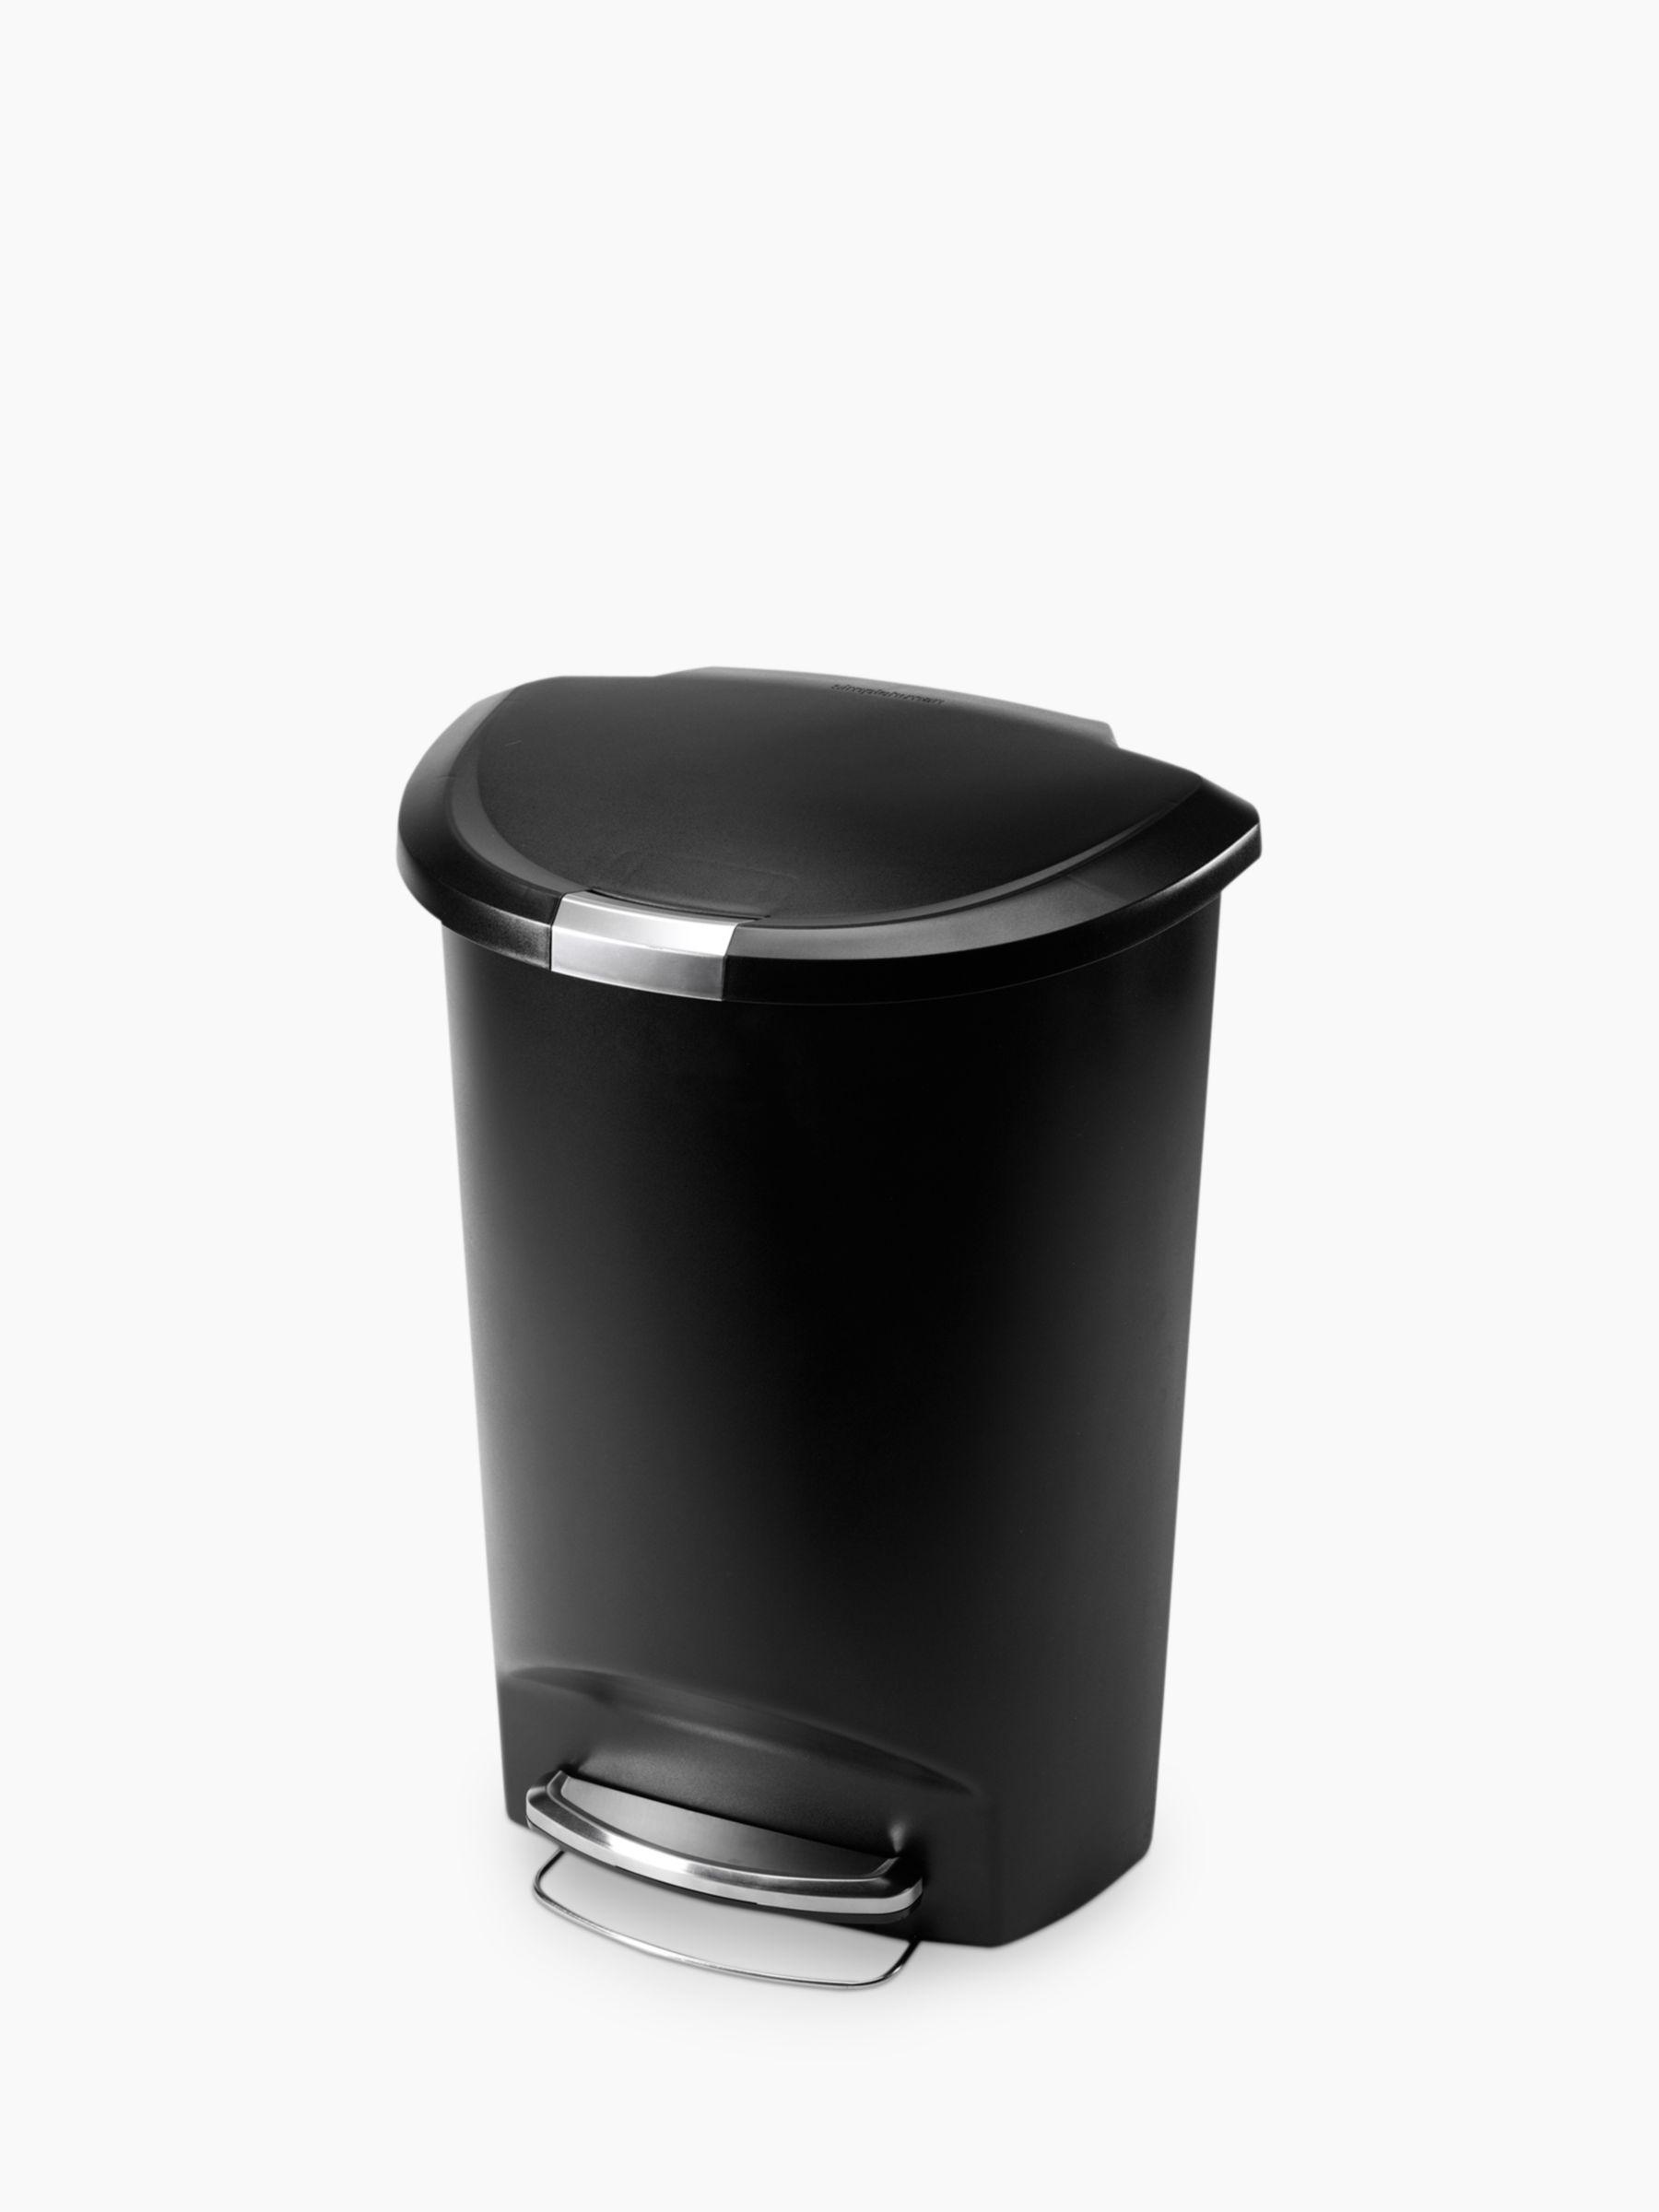 Simplehuman simplehuman Semi-Round Pedal Bin, Black Plastic, 50L